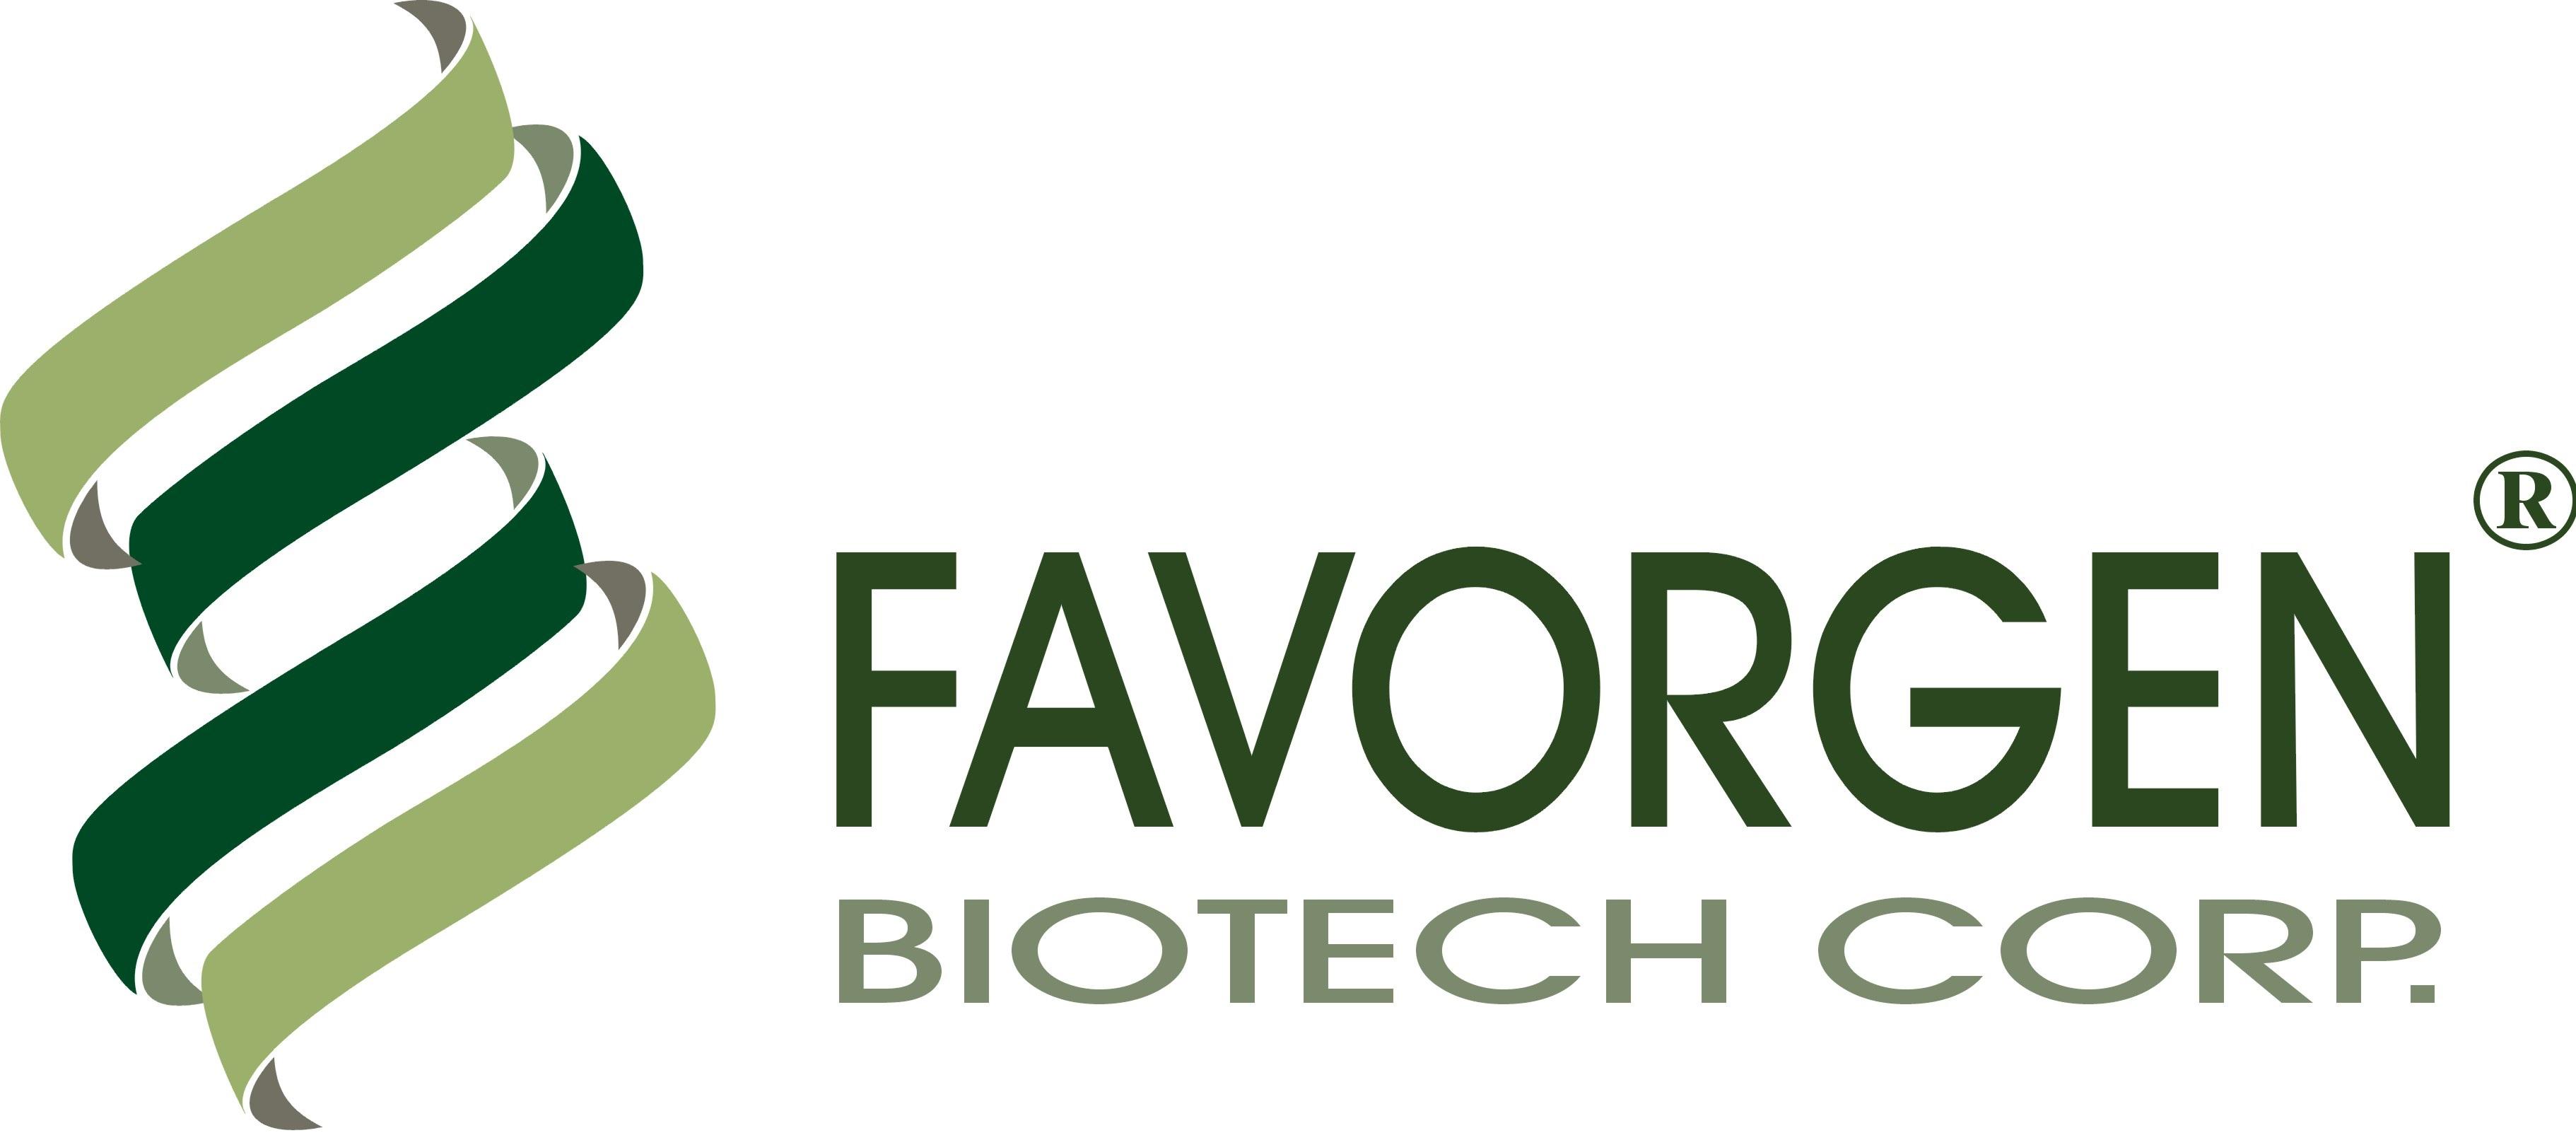 Logo: Favorgen Biotech